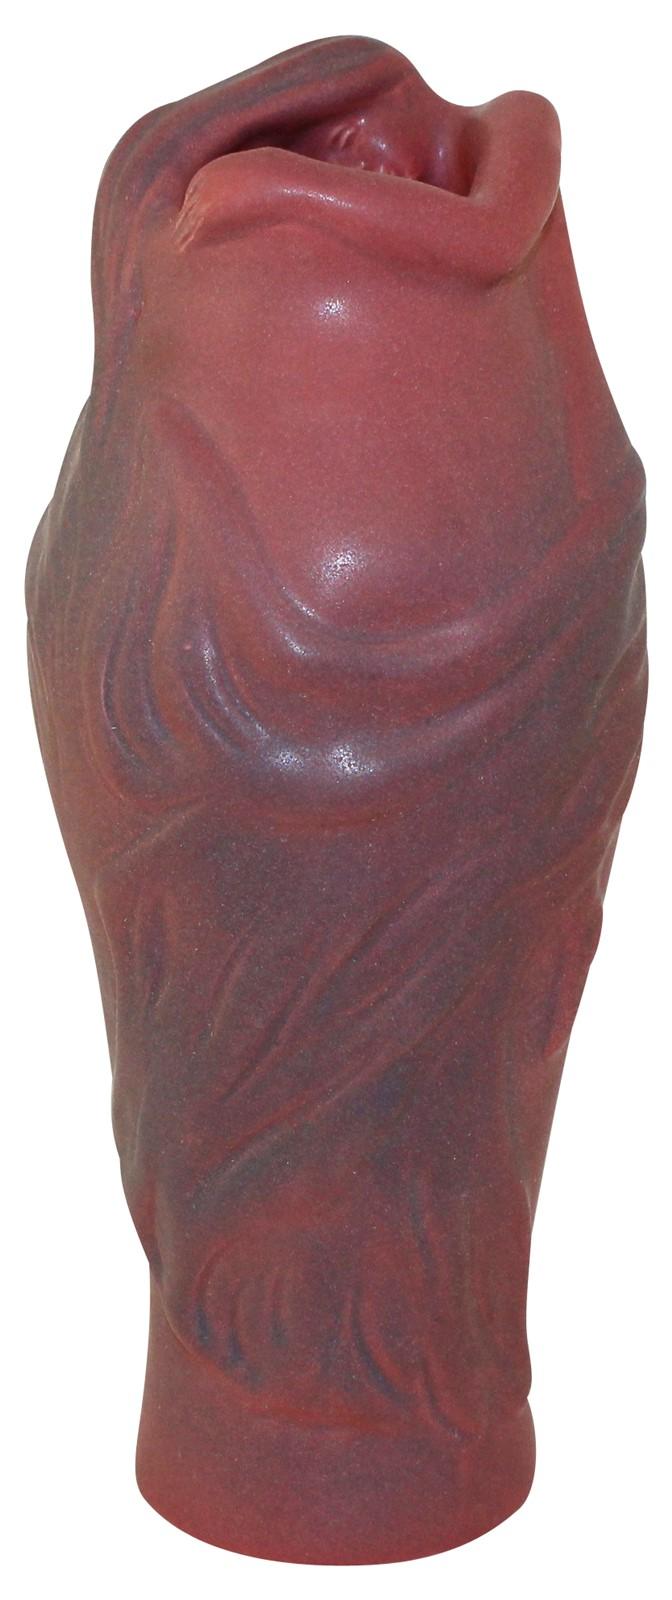 Van Briggle Pottery 1980s Lorelei Mulberry Vase